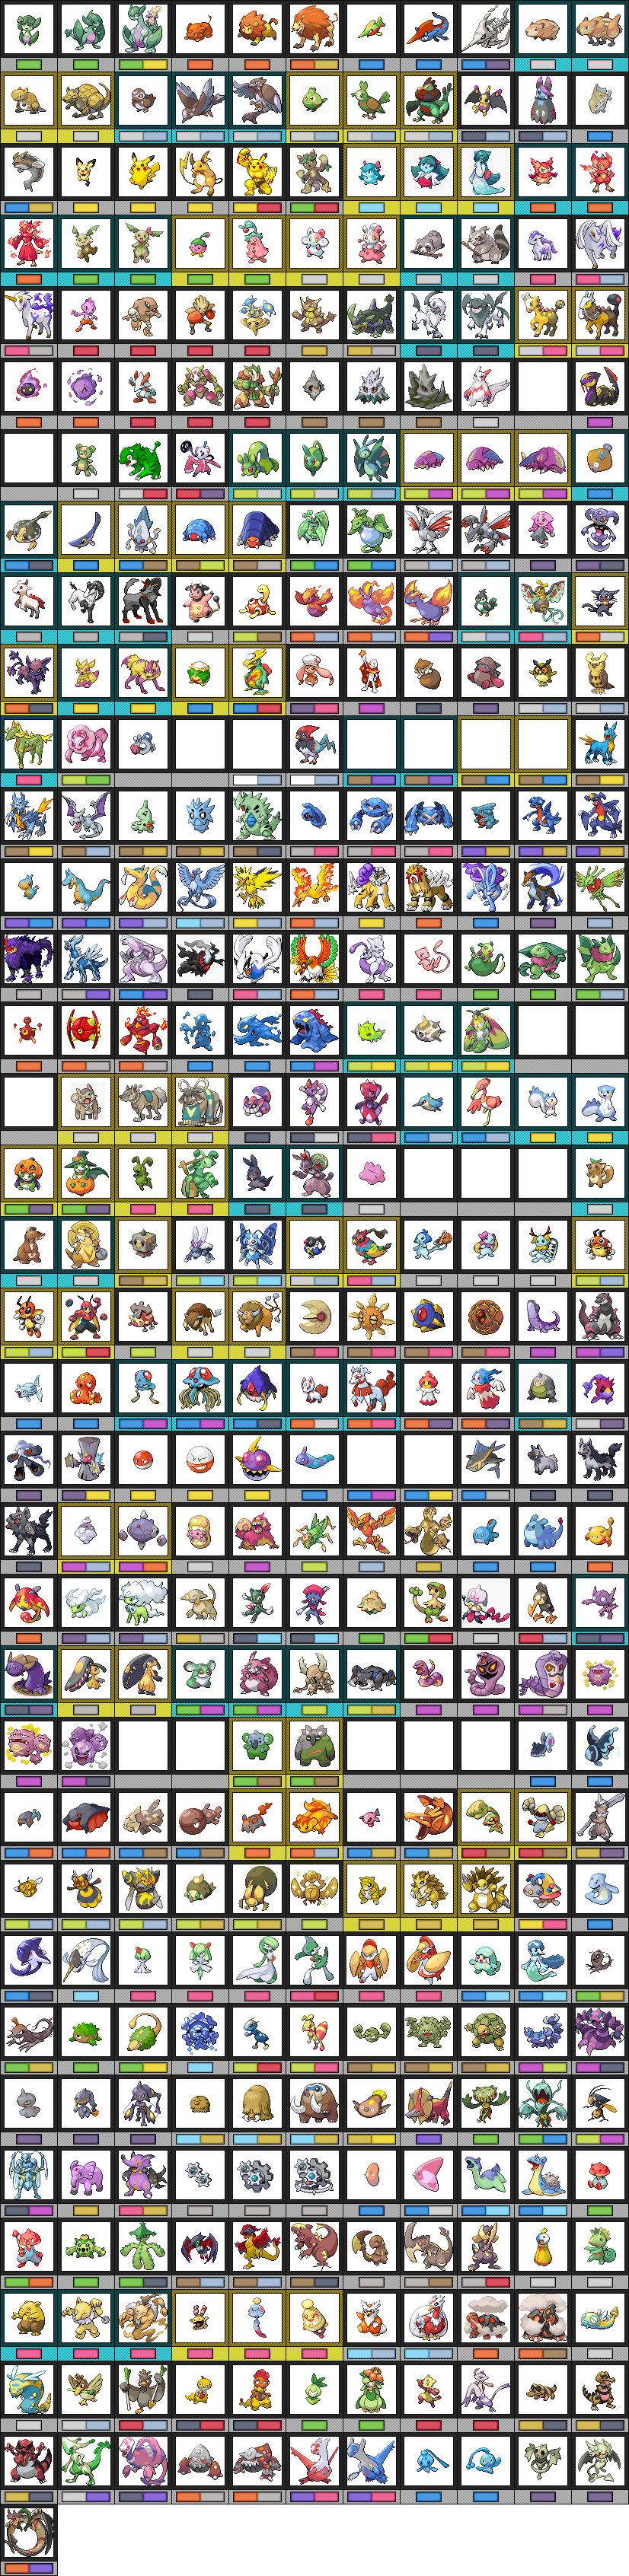 Pokemon Procyon And Deneb Fakedex By Krocf4 On Deviantart